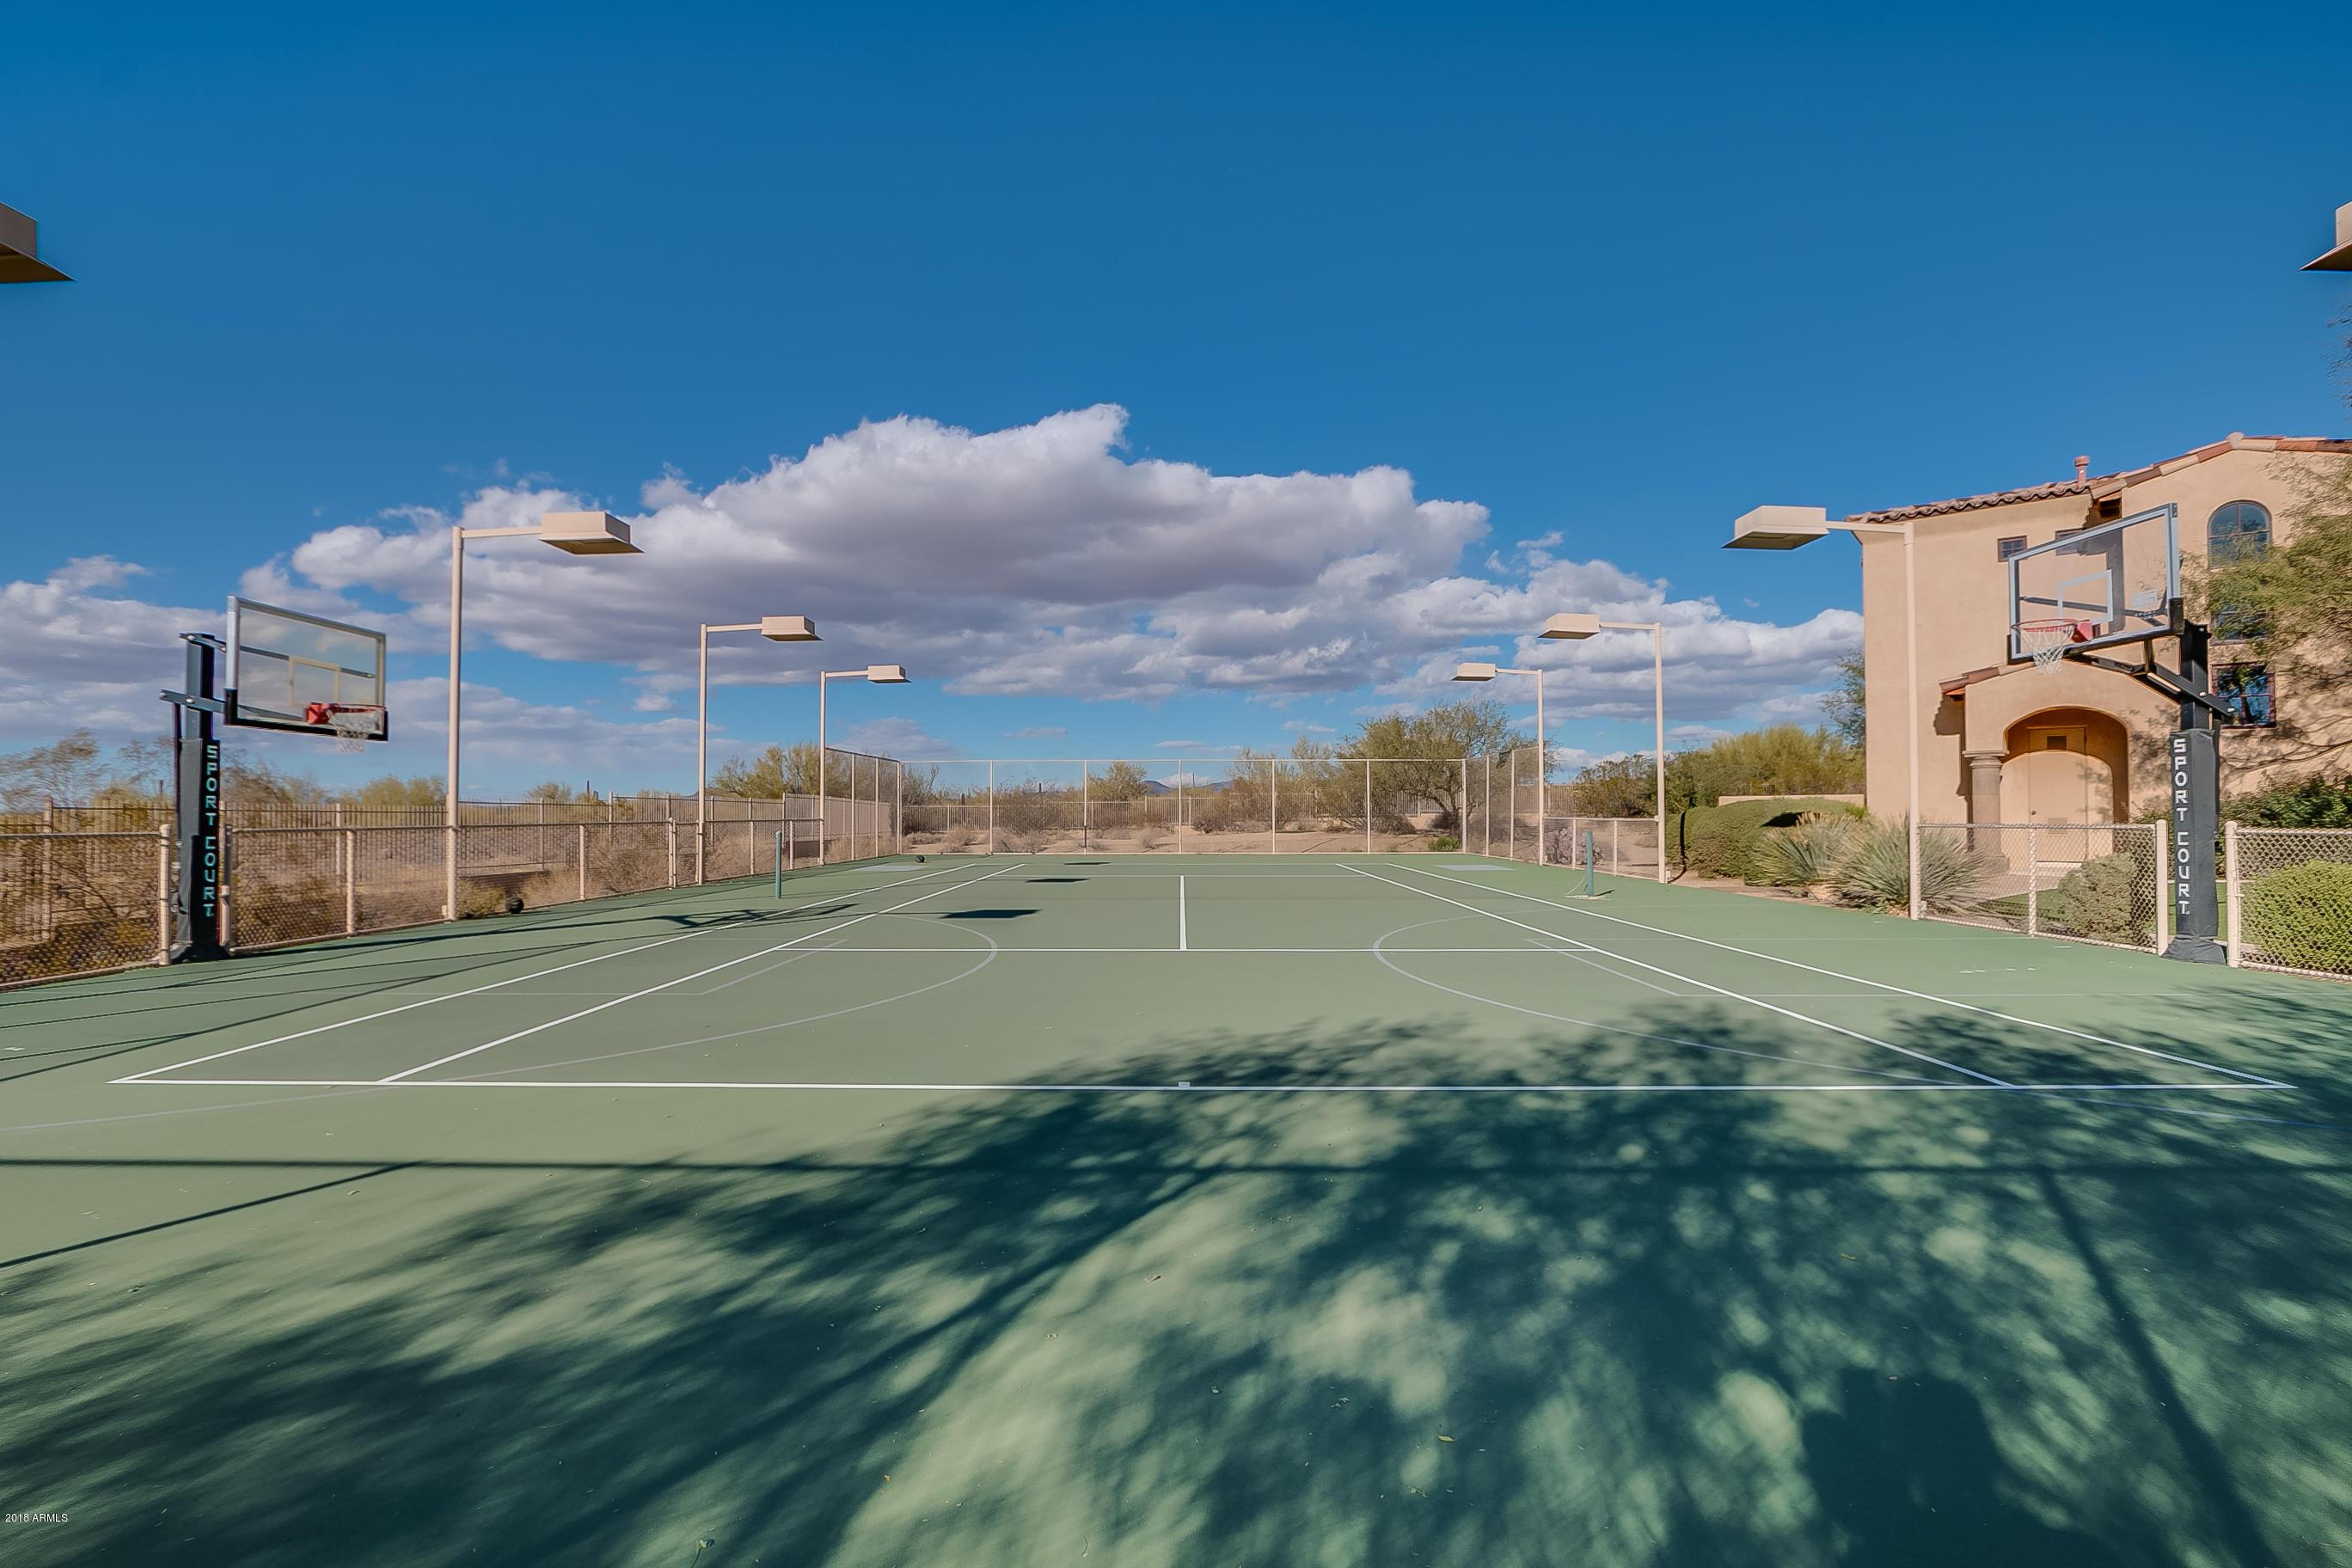 MLS 5860916 24546 N 91ST Street, Scottsdale, AZ 85255 Scottsdale AZ Private Pool